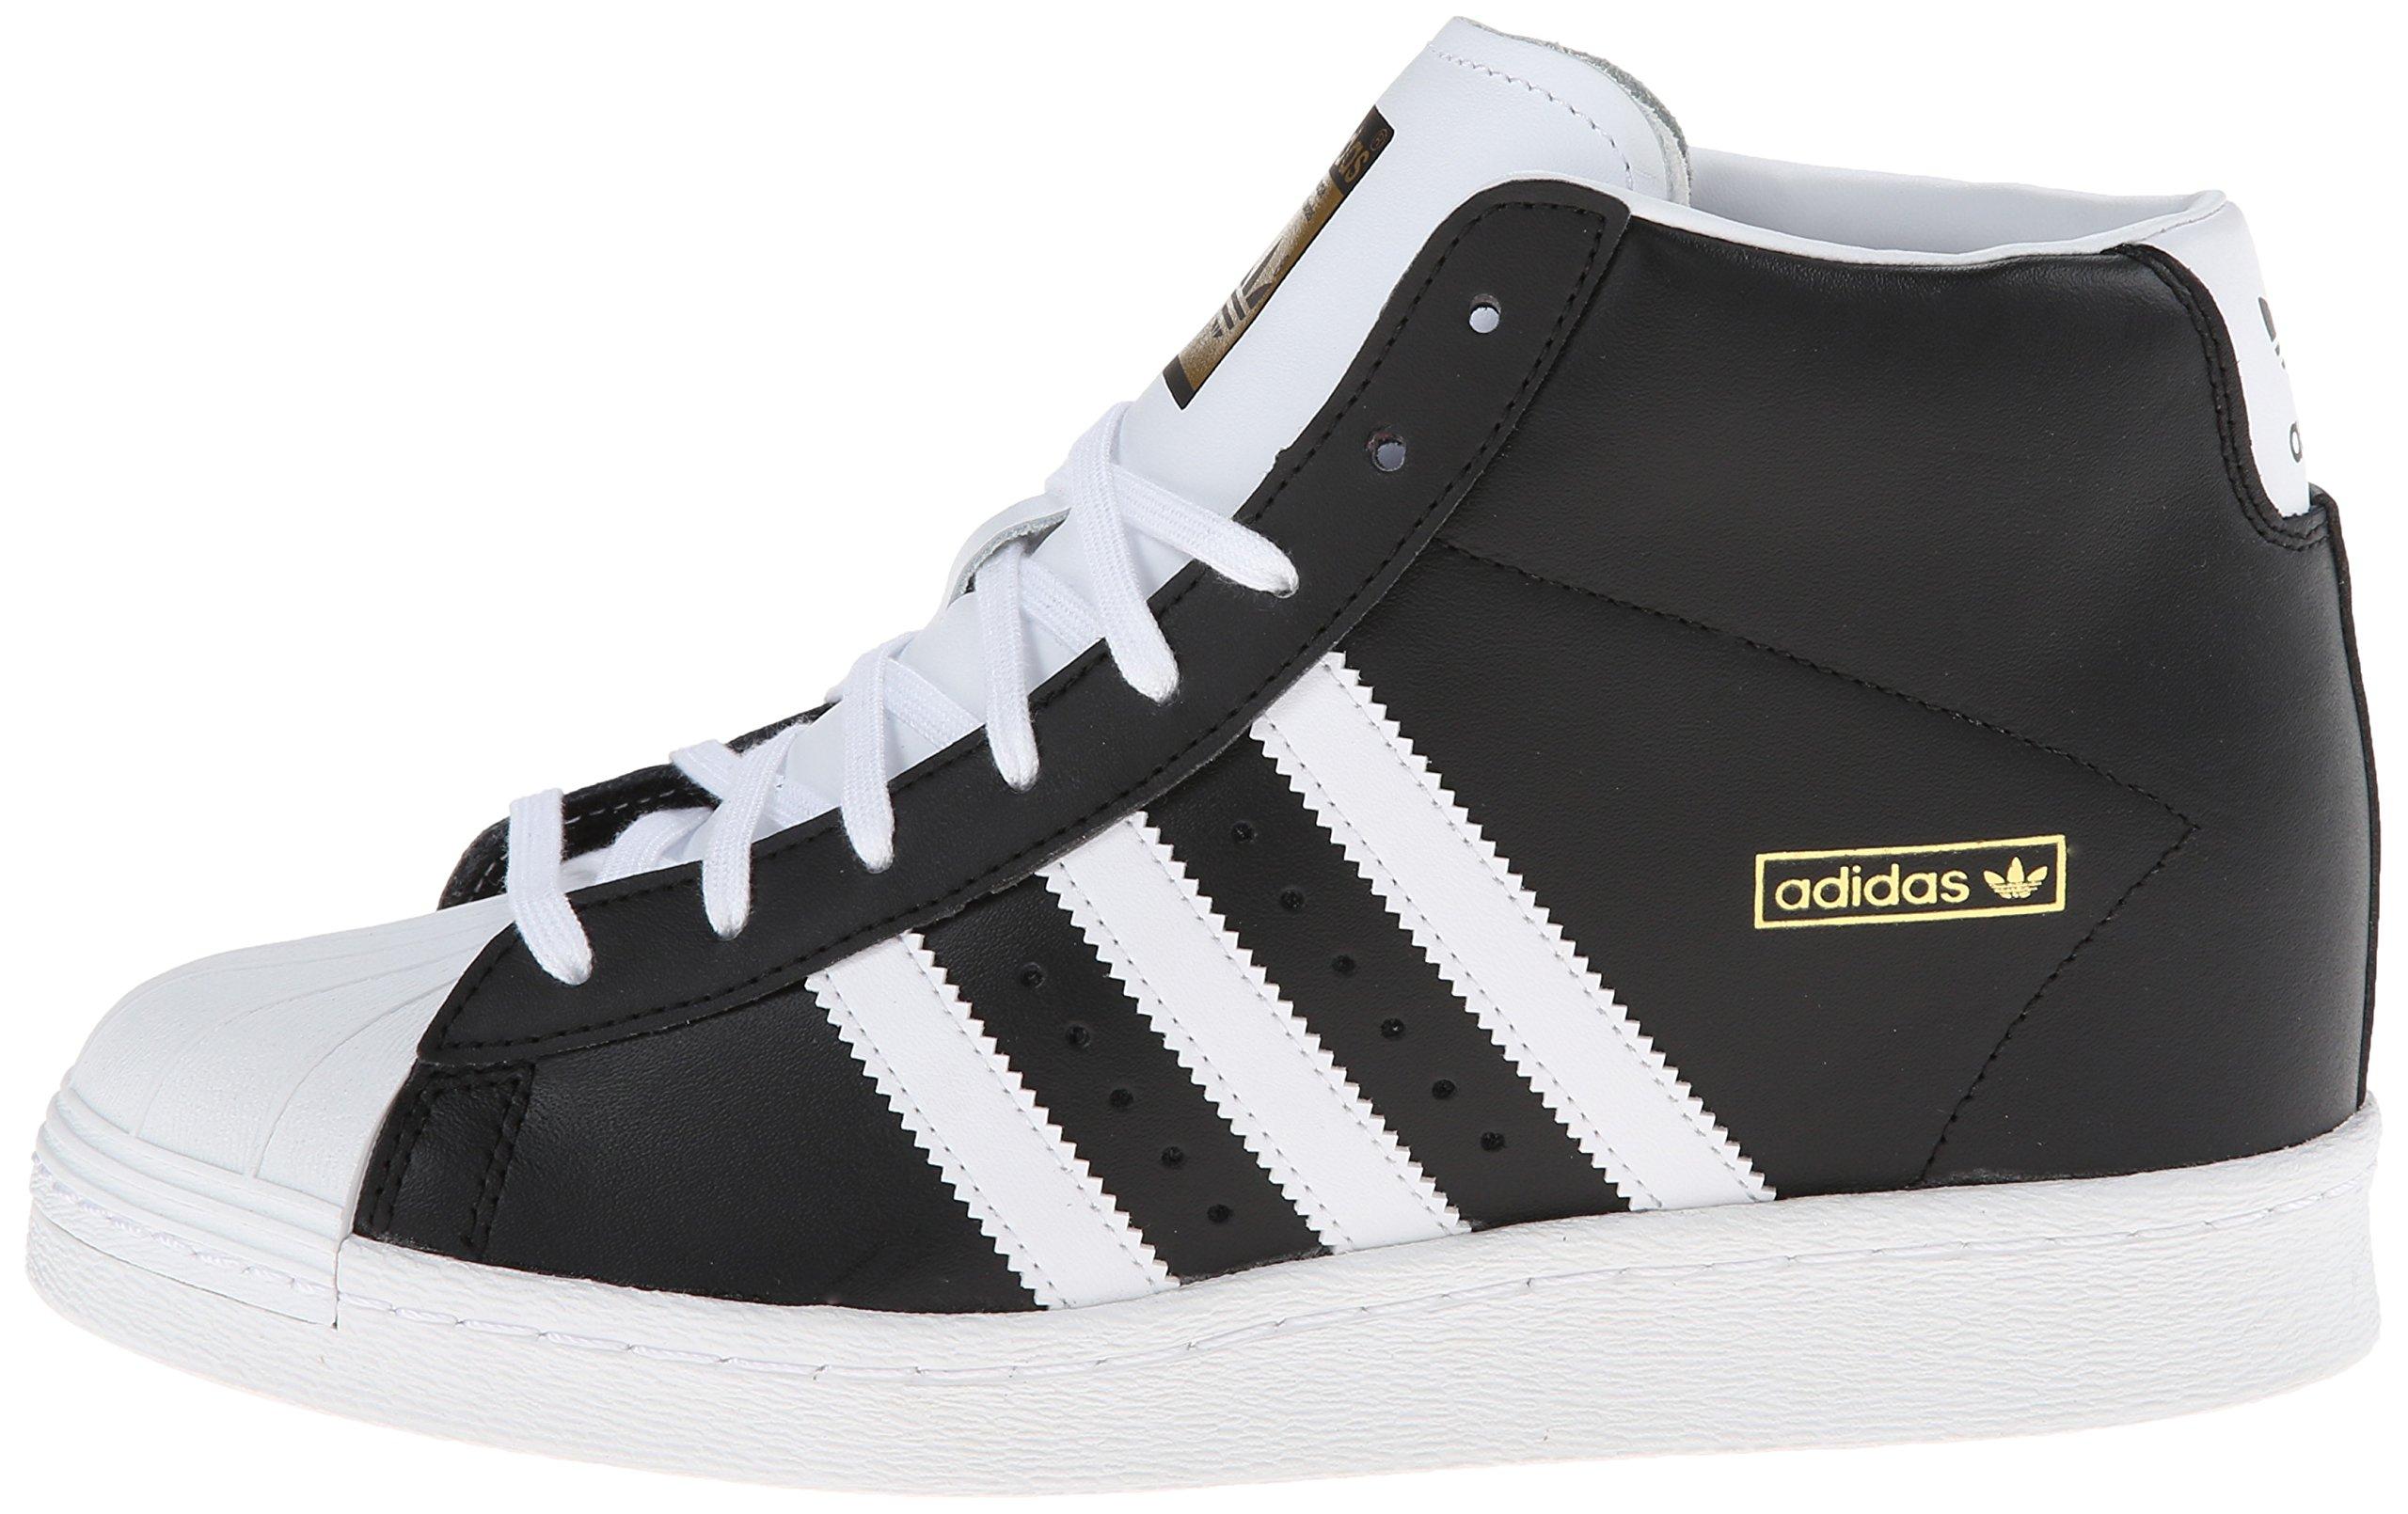 7ad814515 Adidas Originals Superstar Concealed Wedge Black High Top Trainers ...